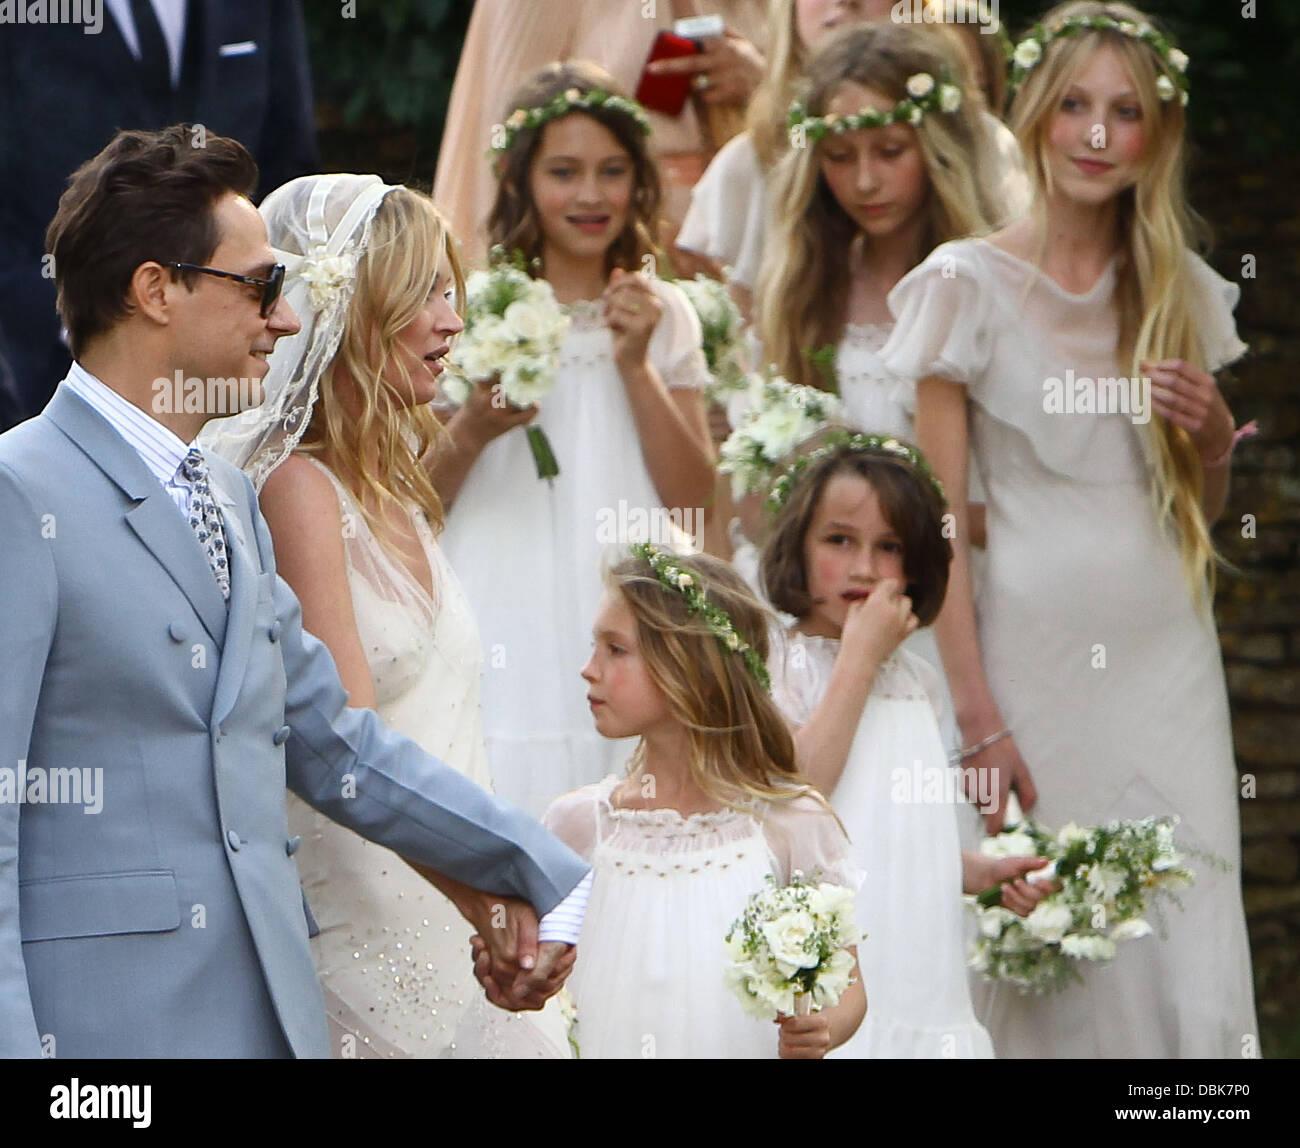 aea353fa54 Wedding Kate Moss Stock Photos Wedding Kate Moss Stock Images